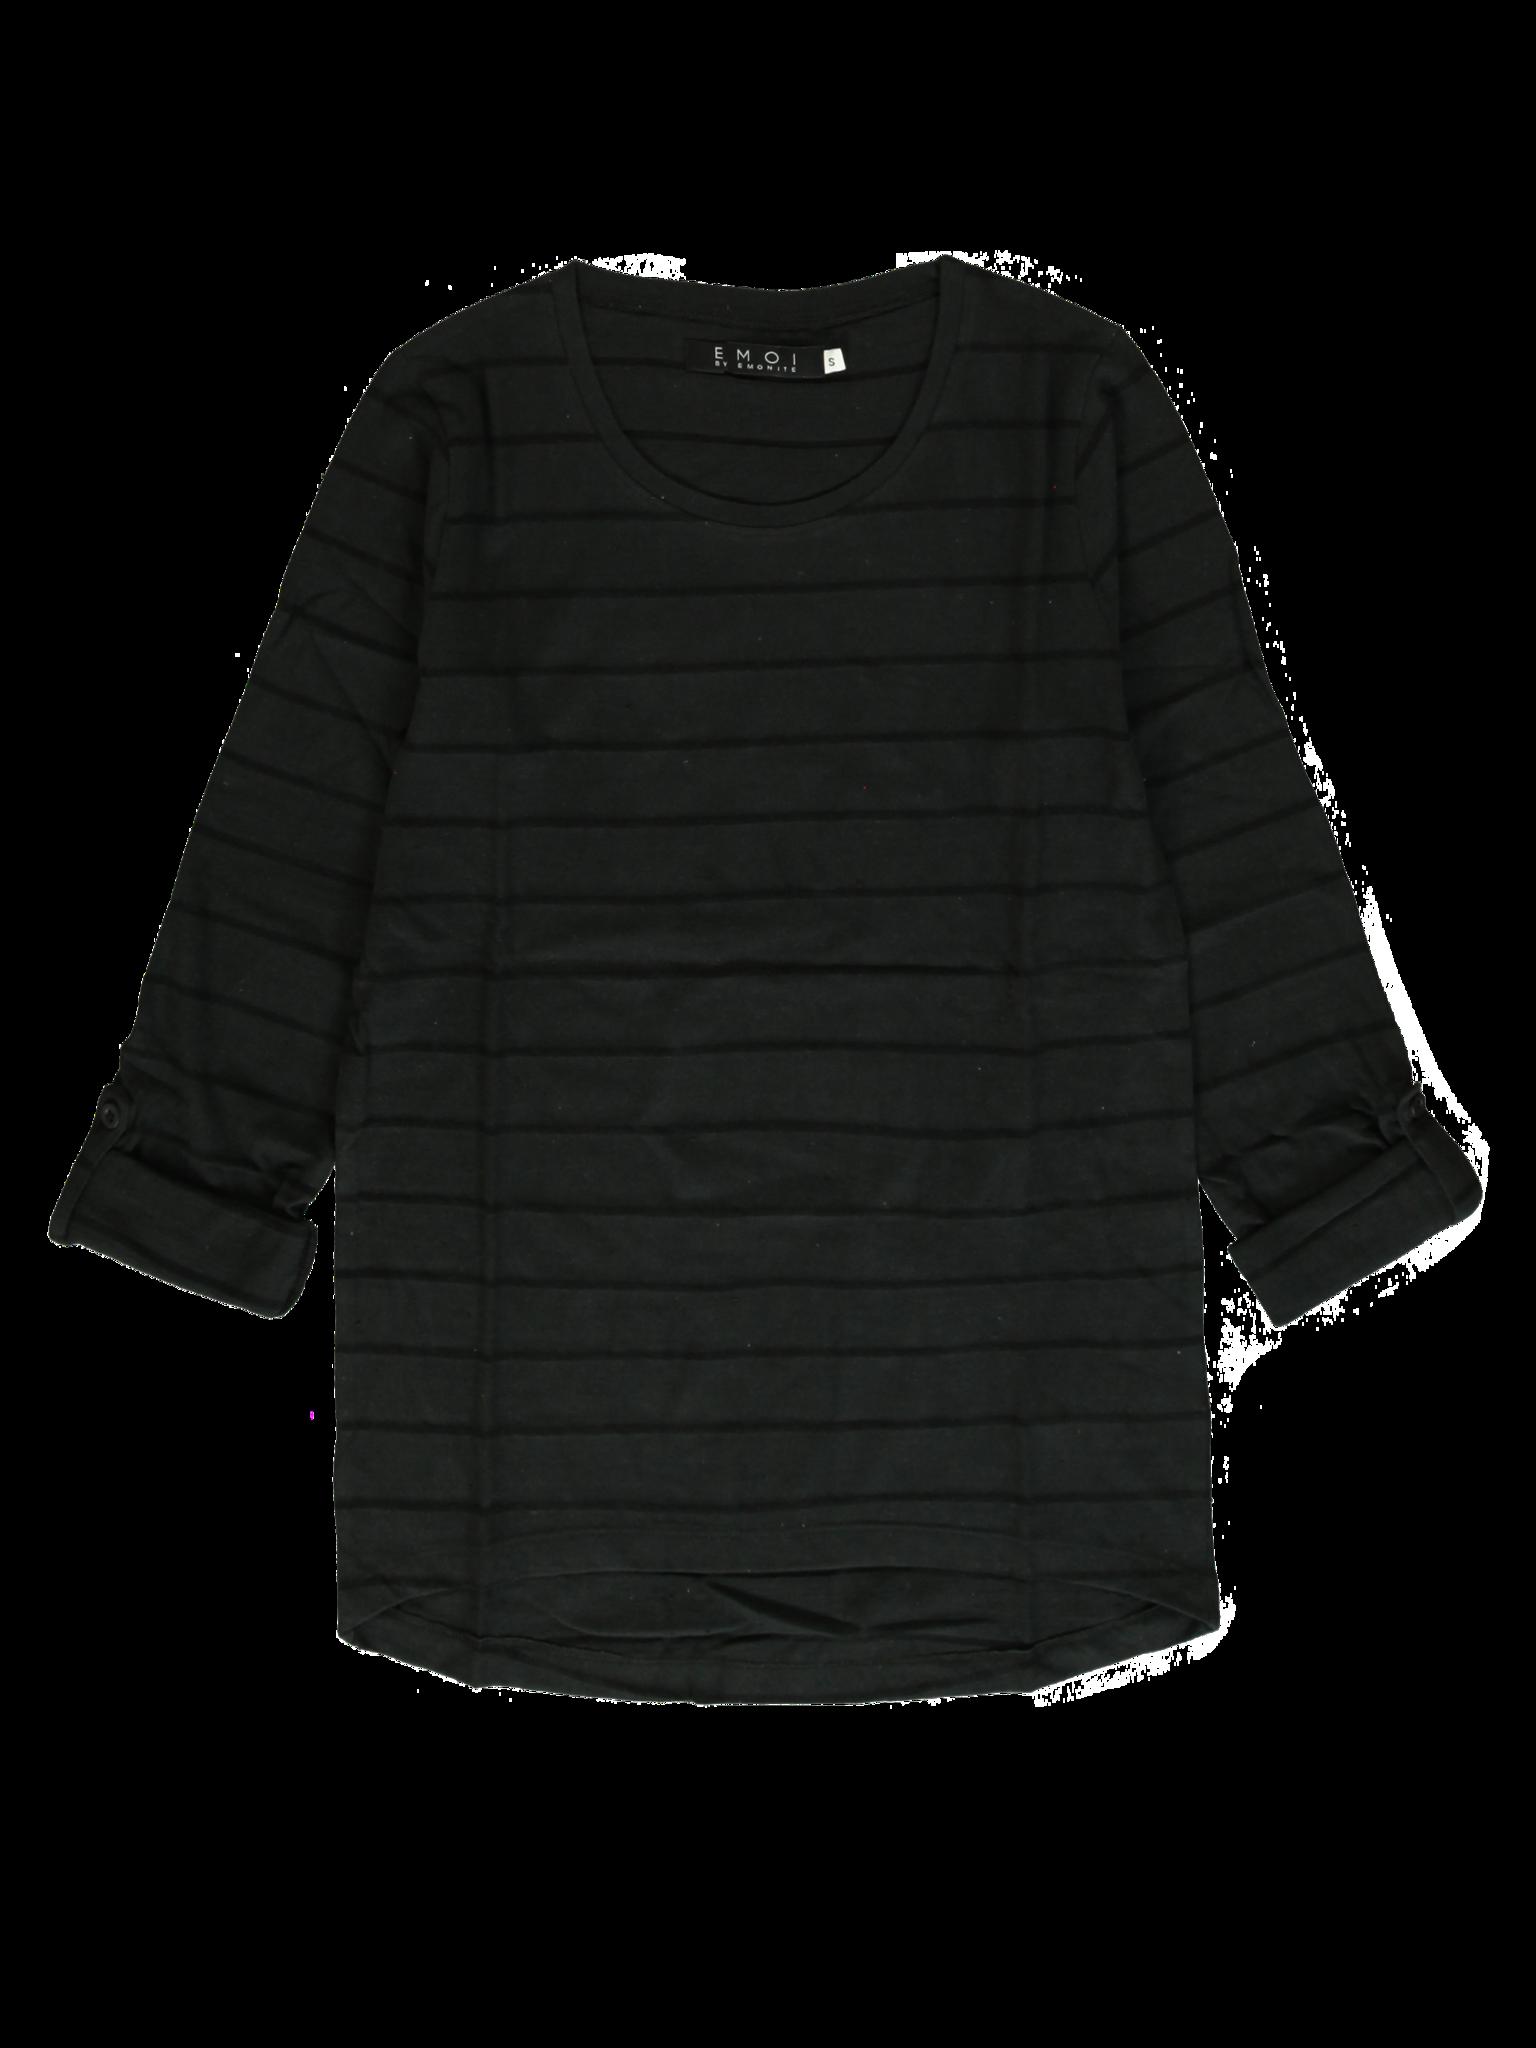 All Brands | Winterproducts Ladies | T-shirt | 18 pcs/box